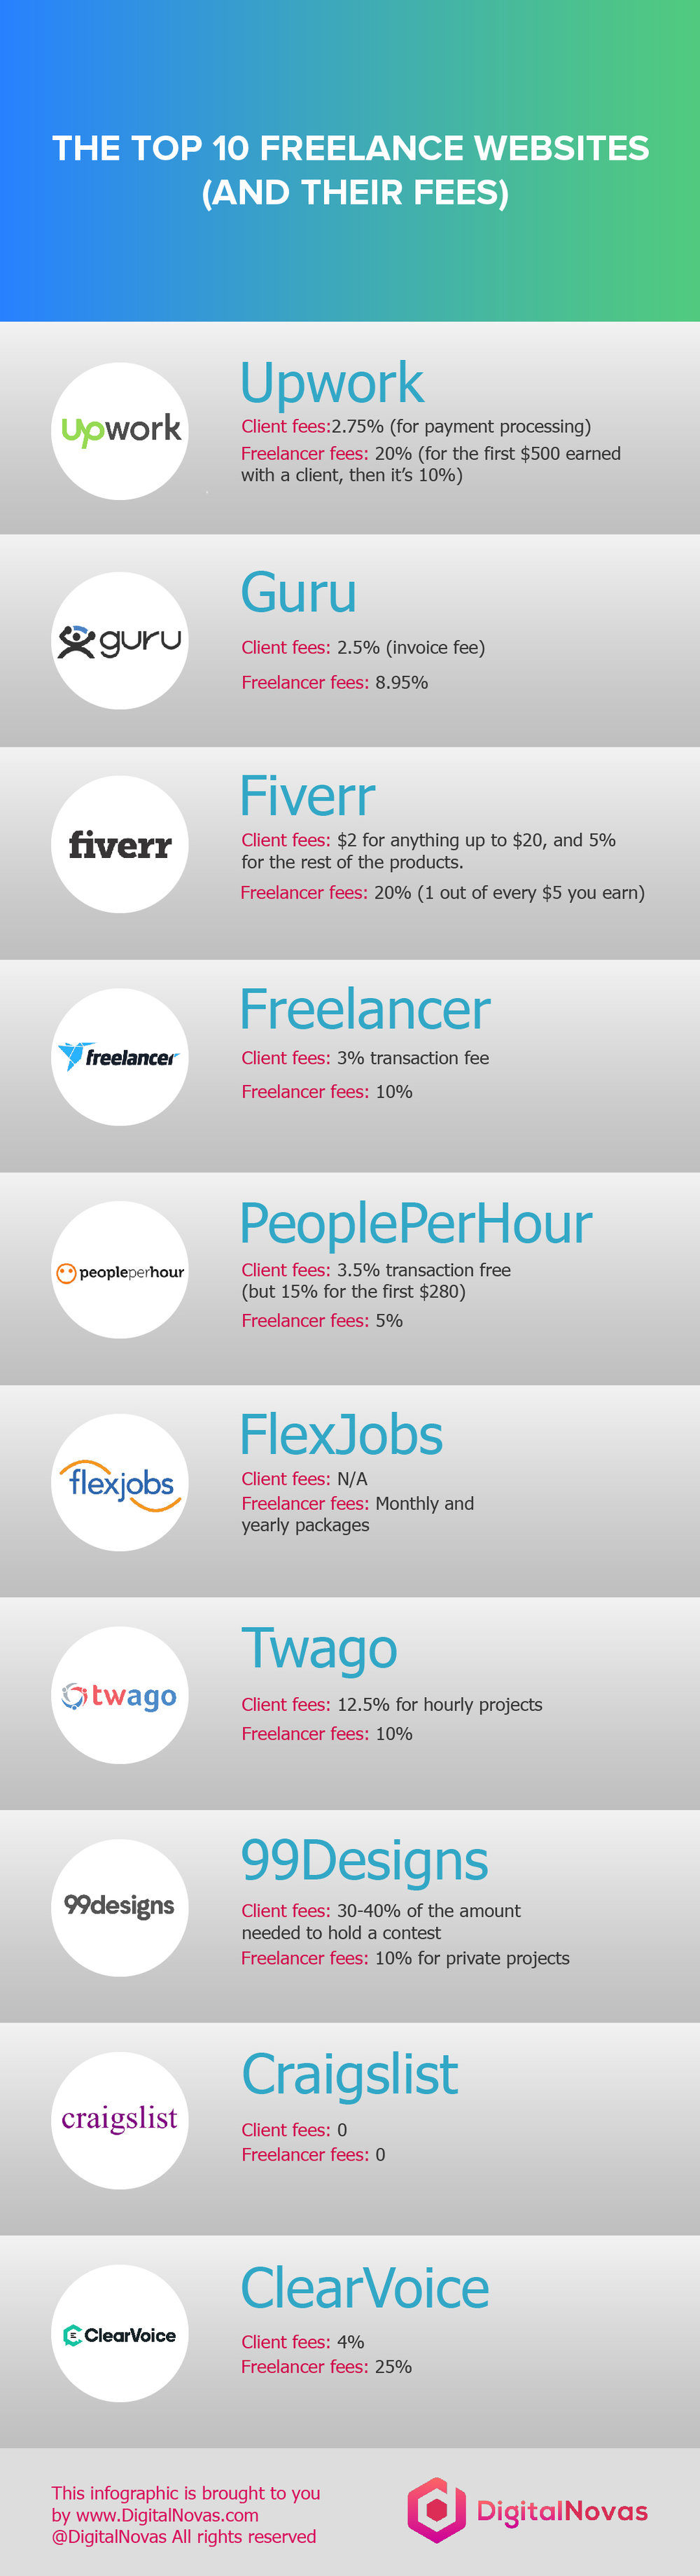 backlinkfy-freelance-websites-and-their-fees.jpg